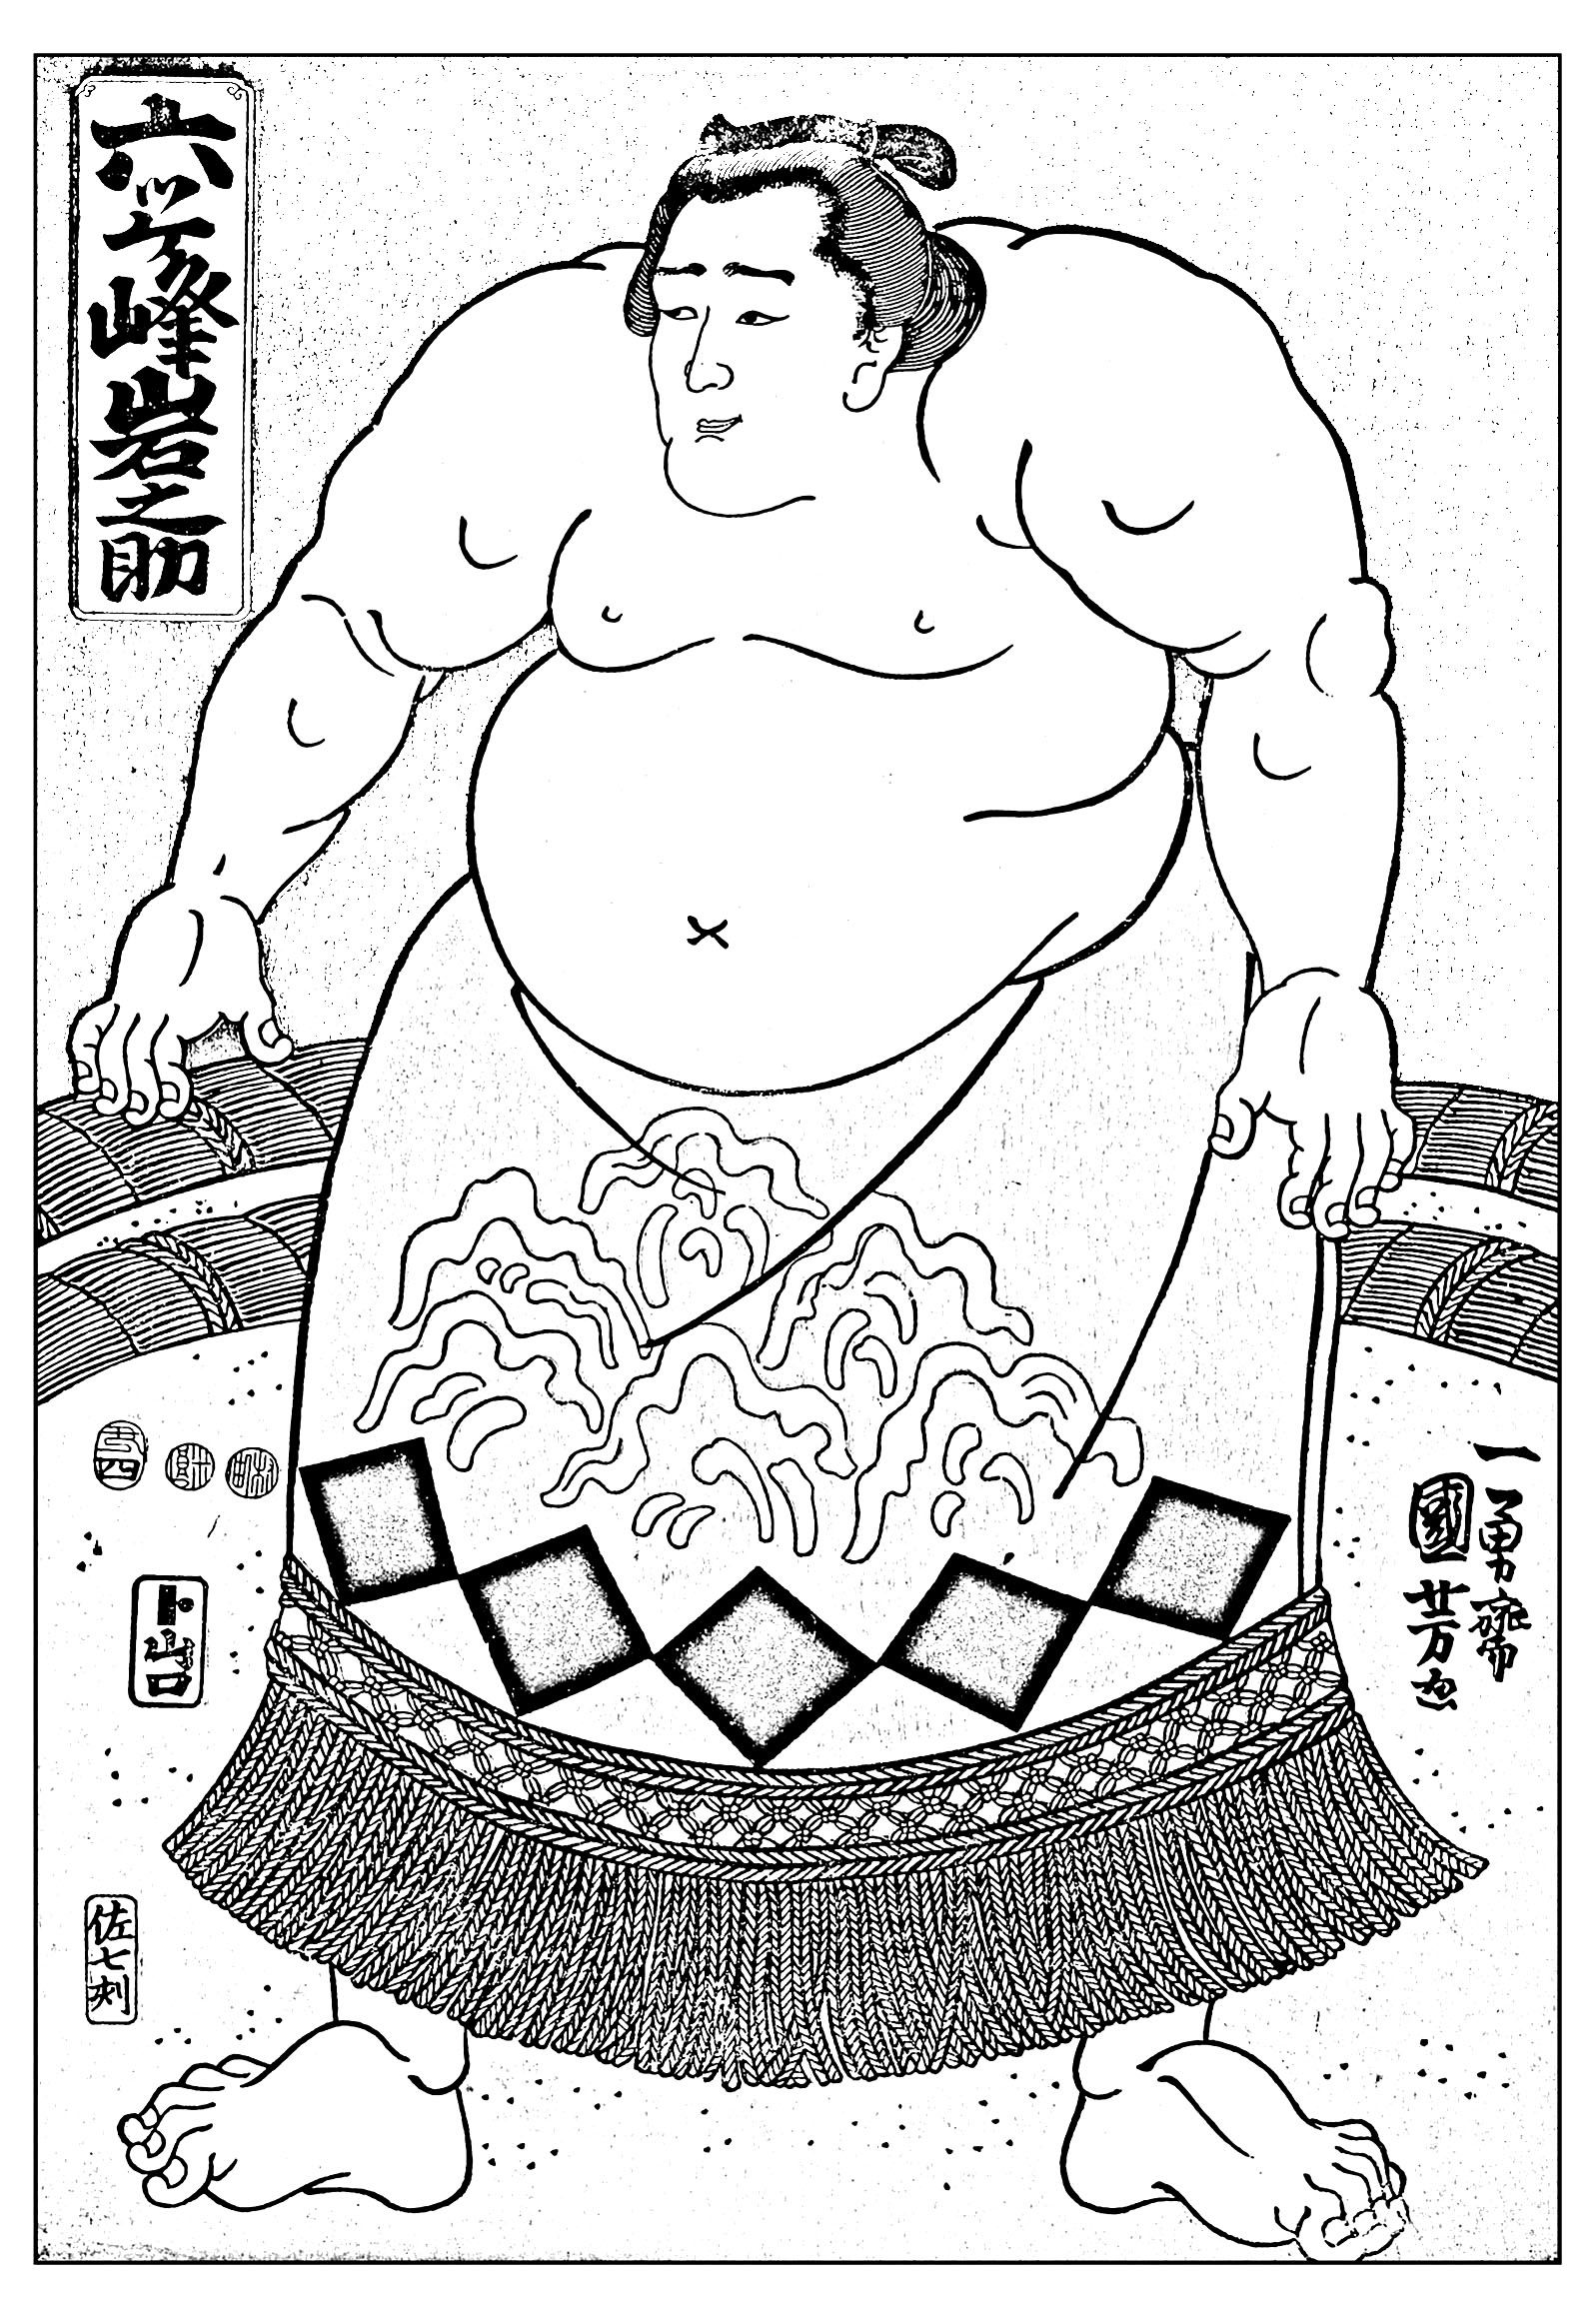 Coloring pages japan - Free Coloring Page Coloring Japan Sumo Kuniyoshi Utagawa A Drawing By